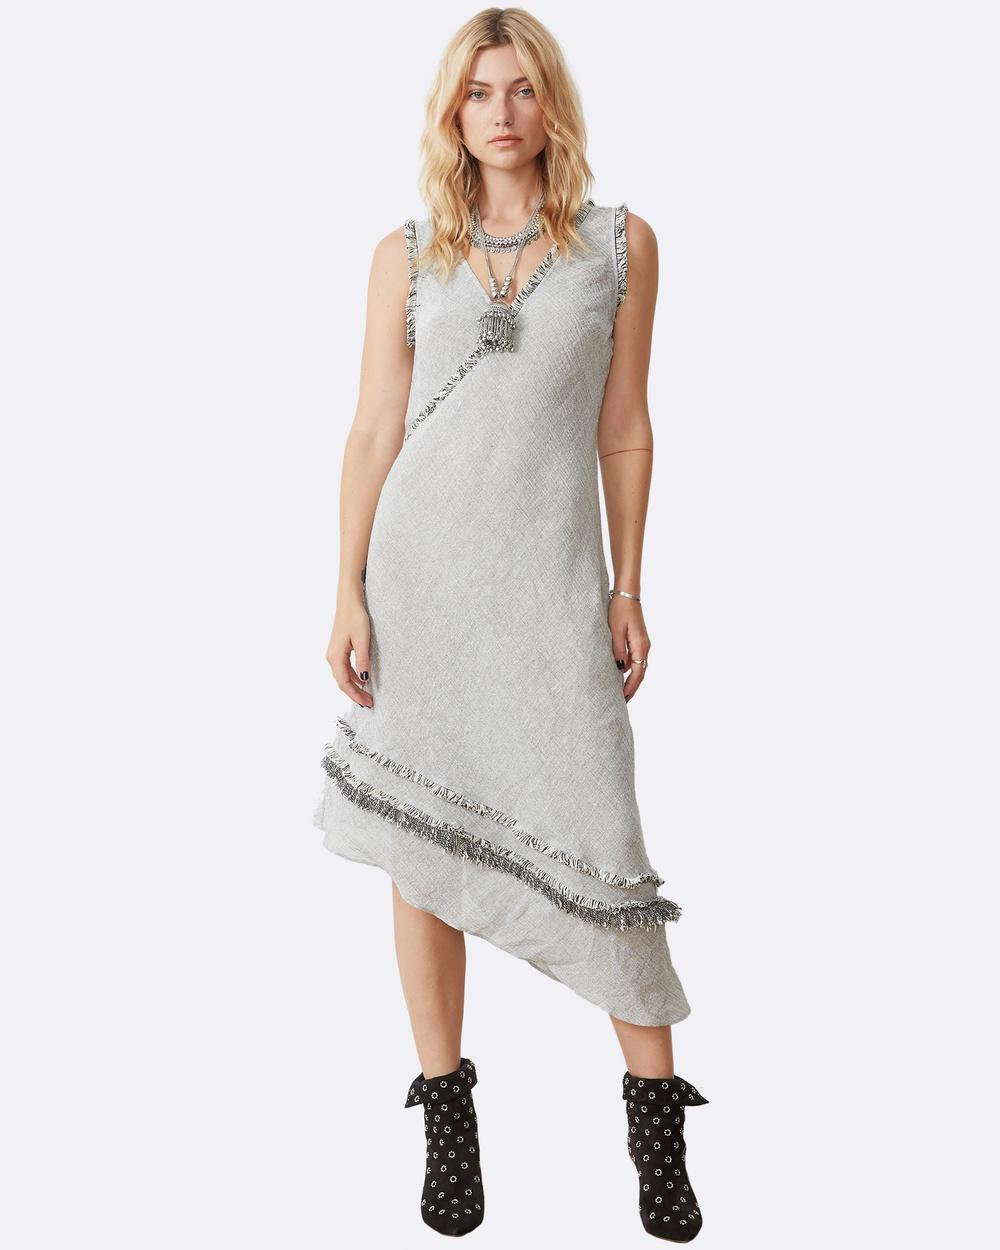 Stevie May Danica Midi Dress Dresses Grey Danica Midi Dress